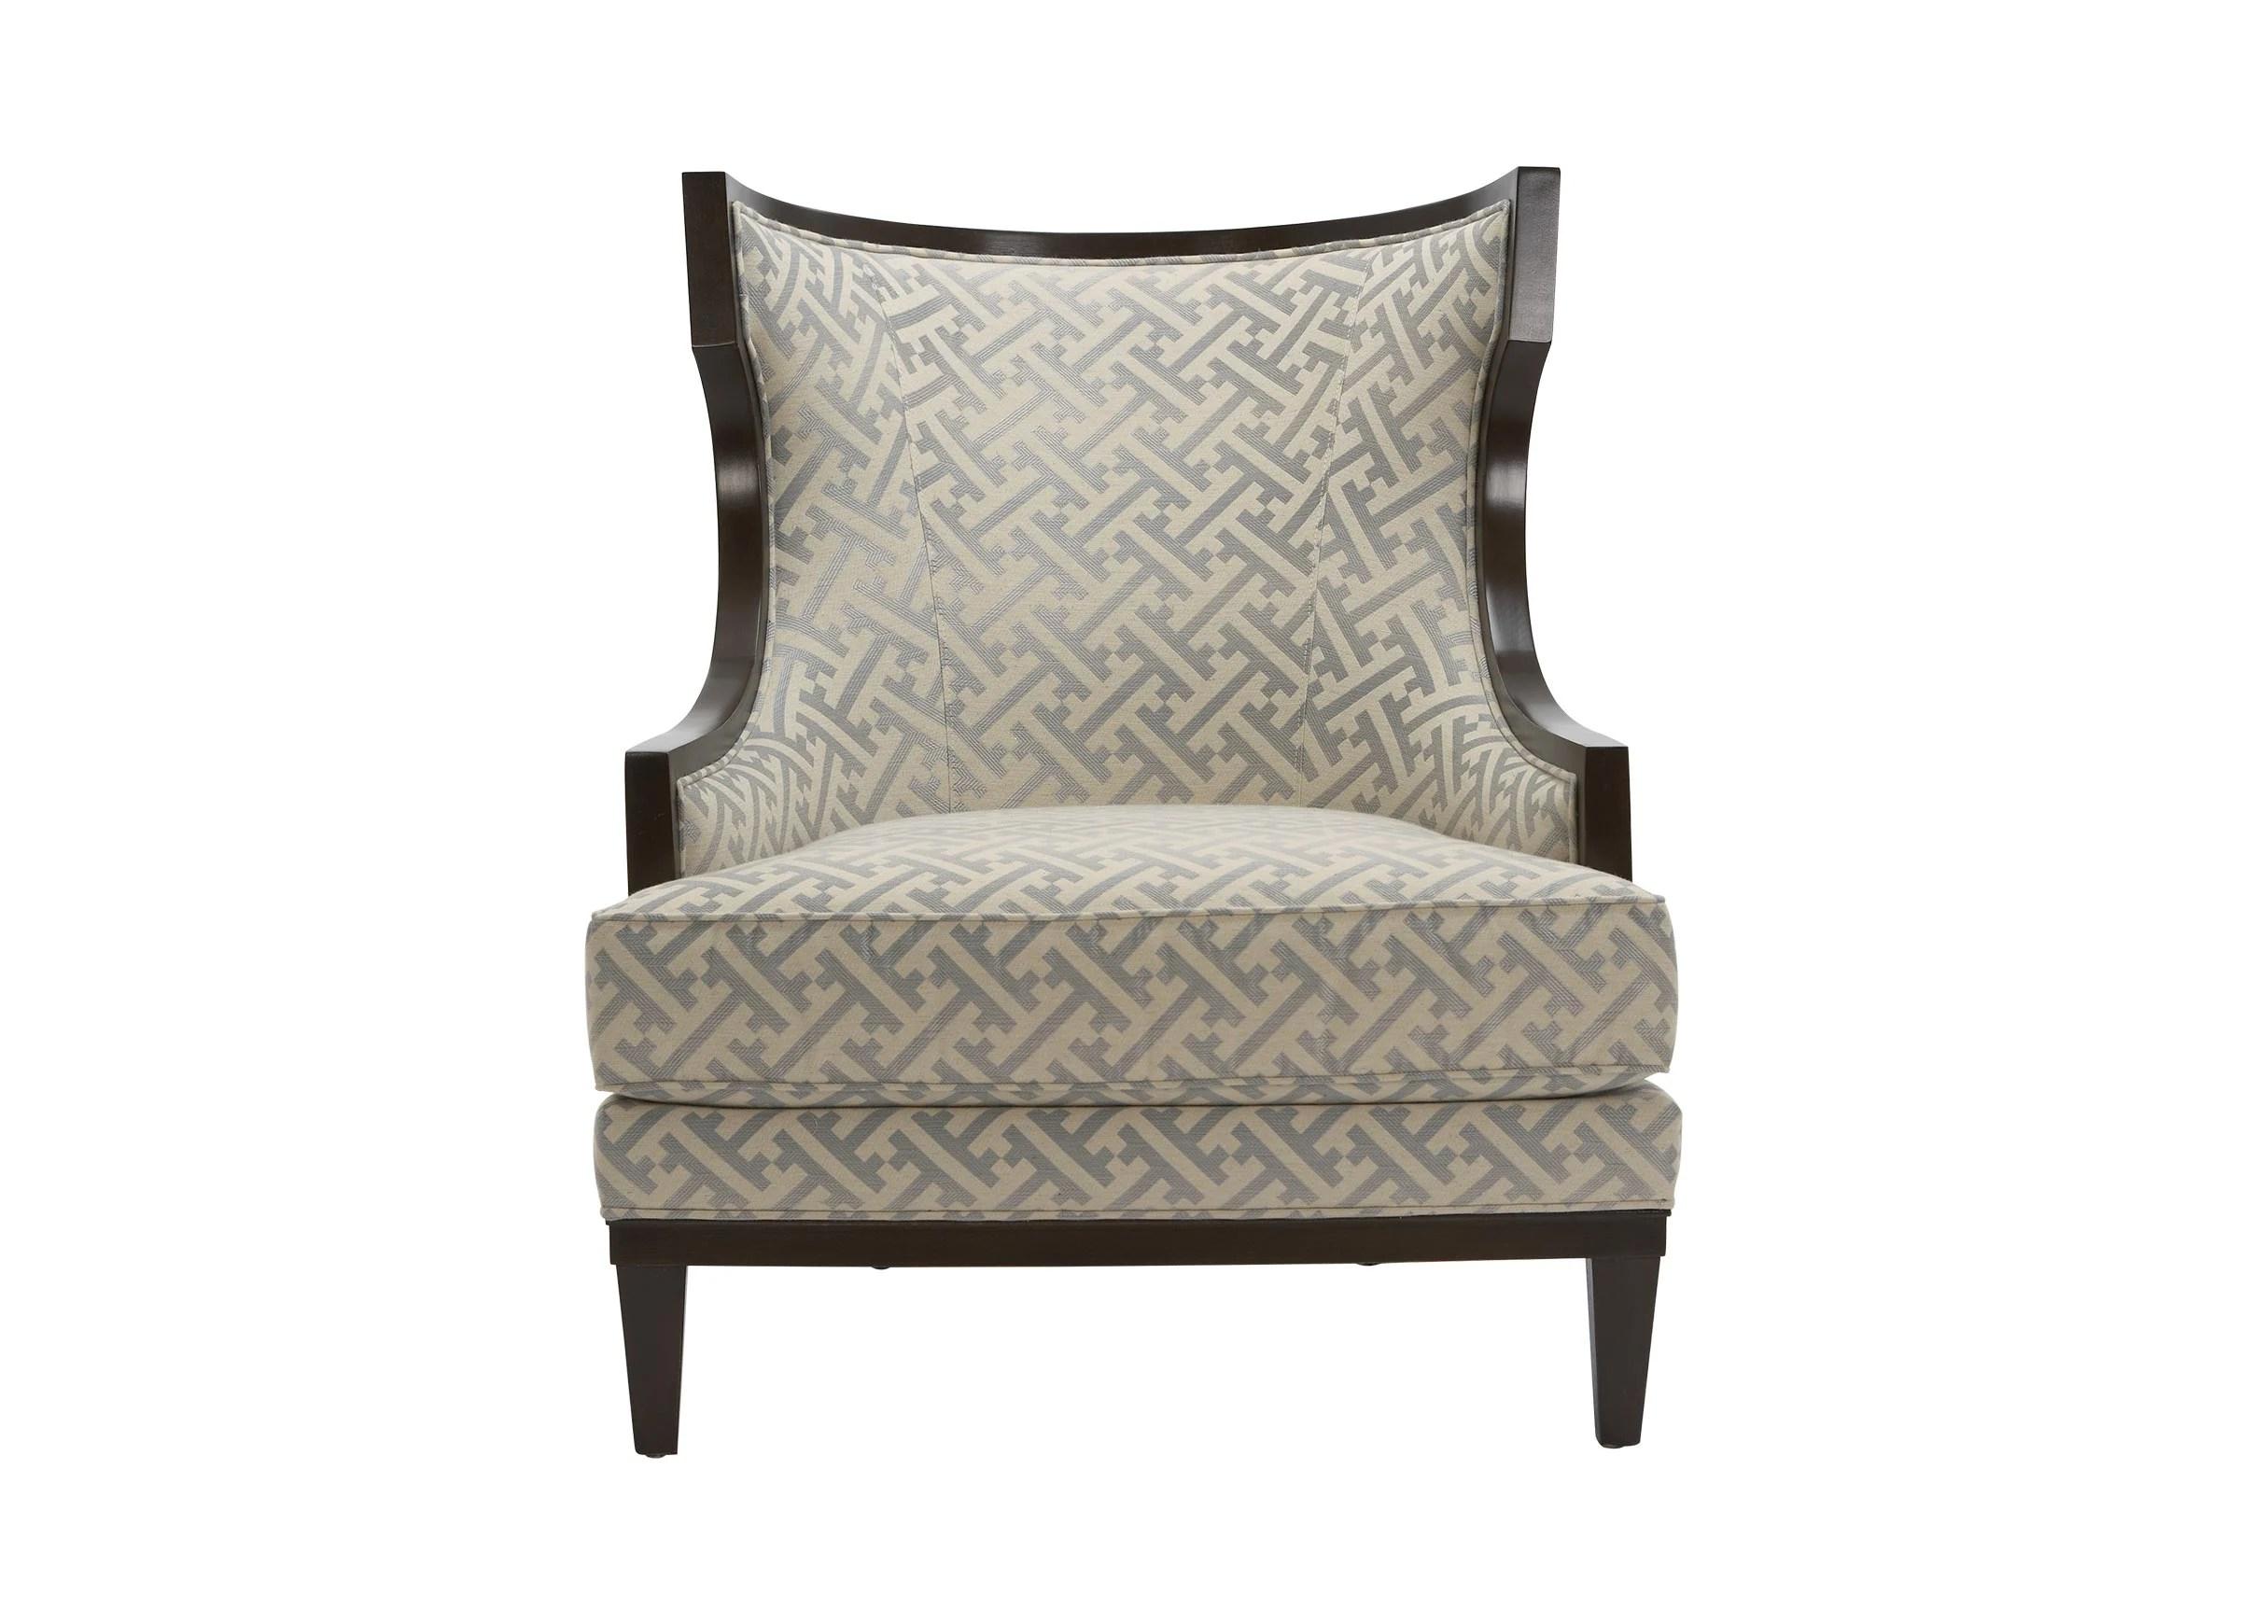 ethan allen recliners chairs beach chair target corrine and chaises